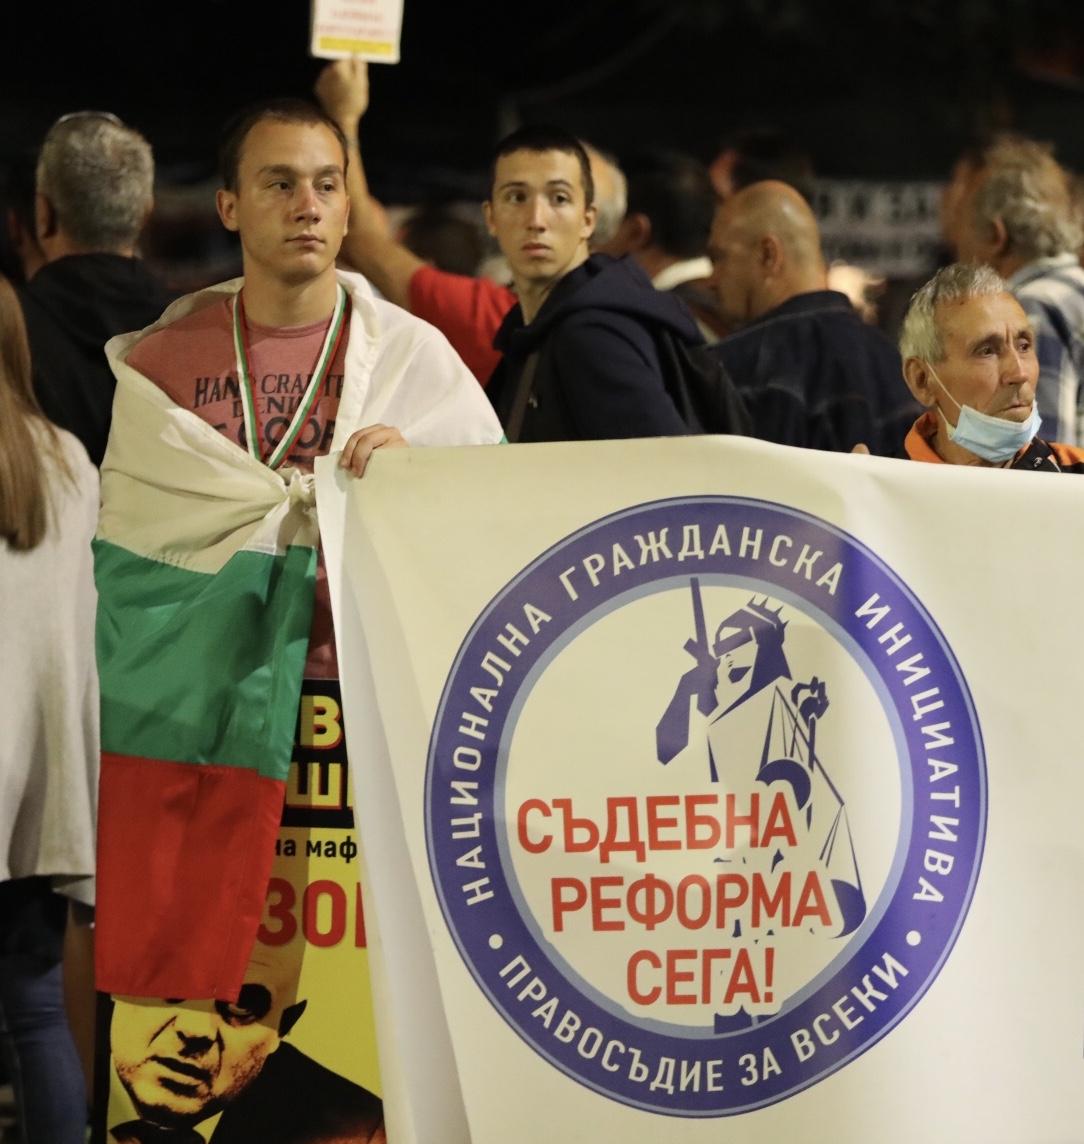 <p>77-ма вечер на антиправителствени протести</p>